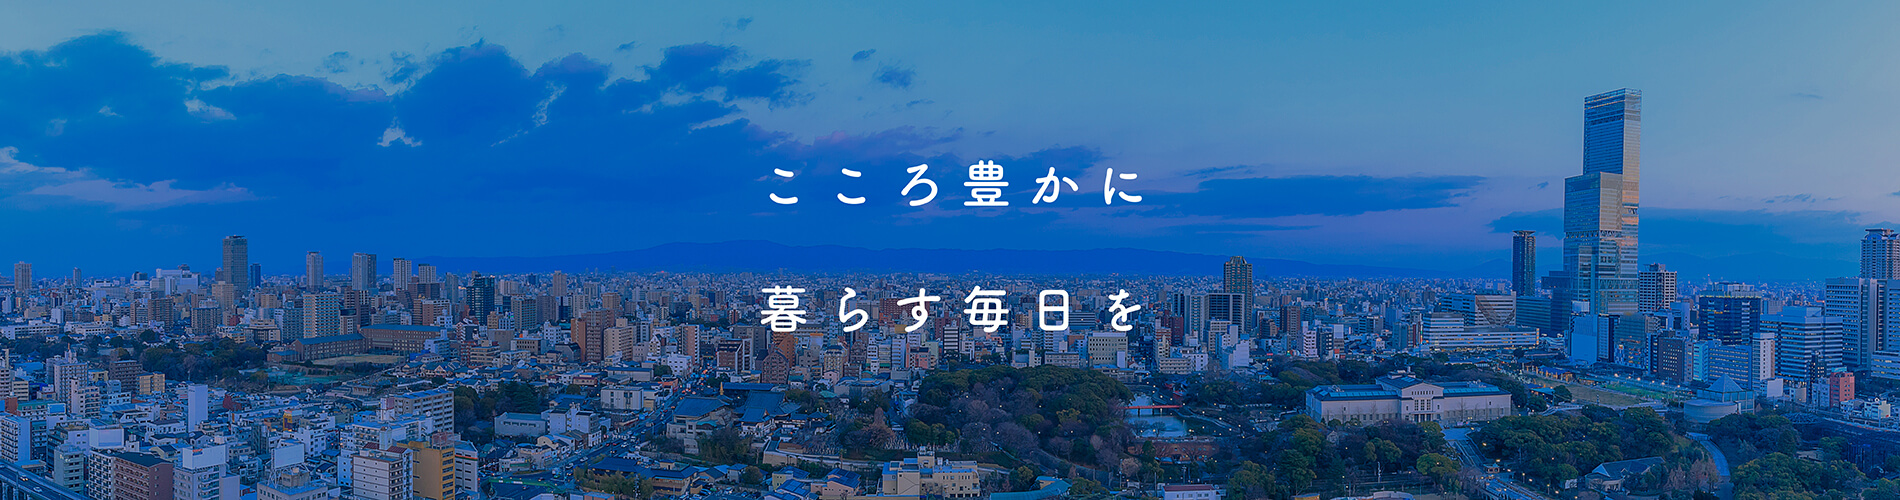 https://www.shikishima-j.co.jp/app-def/S-102/corporate/wp-content/uploads/2021/09/slide_pc.jpg